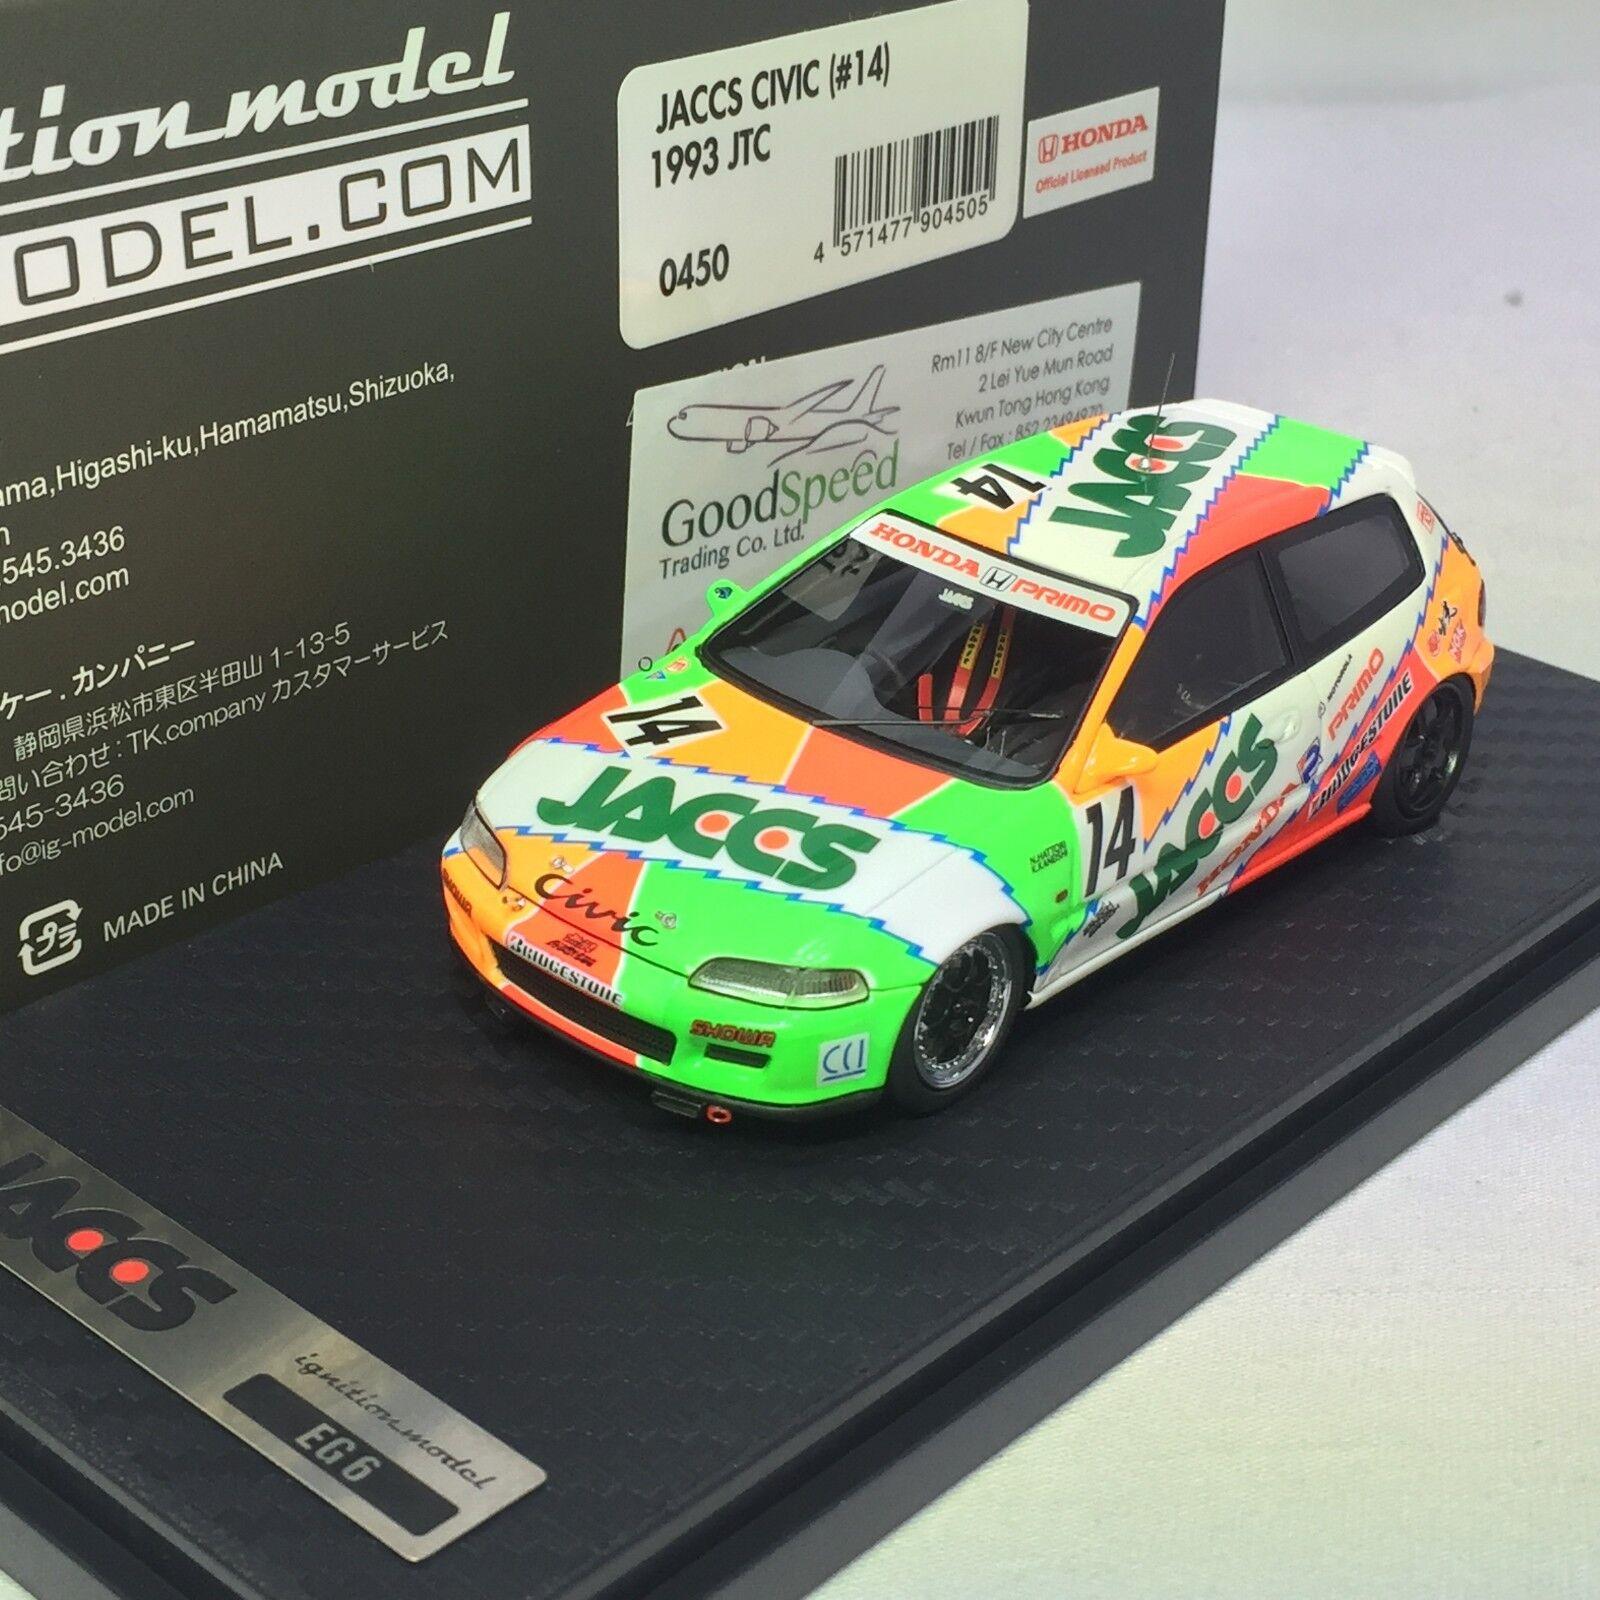 1 43 d'allumage Honda CIVIC Vtech  14 EG6 1993 JTC jaccs Honda Primo  IG0450